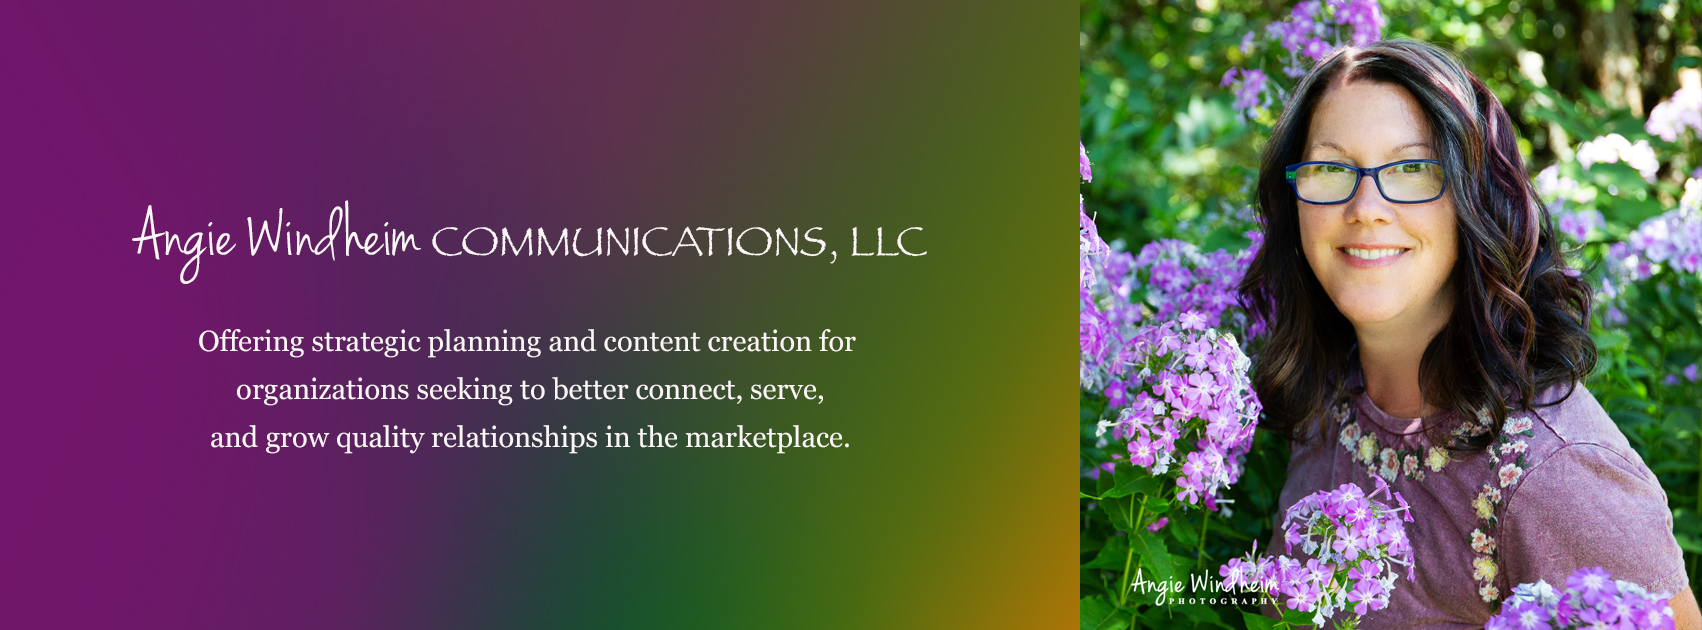 Angie Windheim Communications LLC